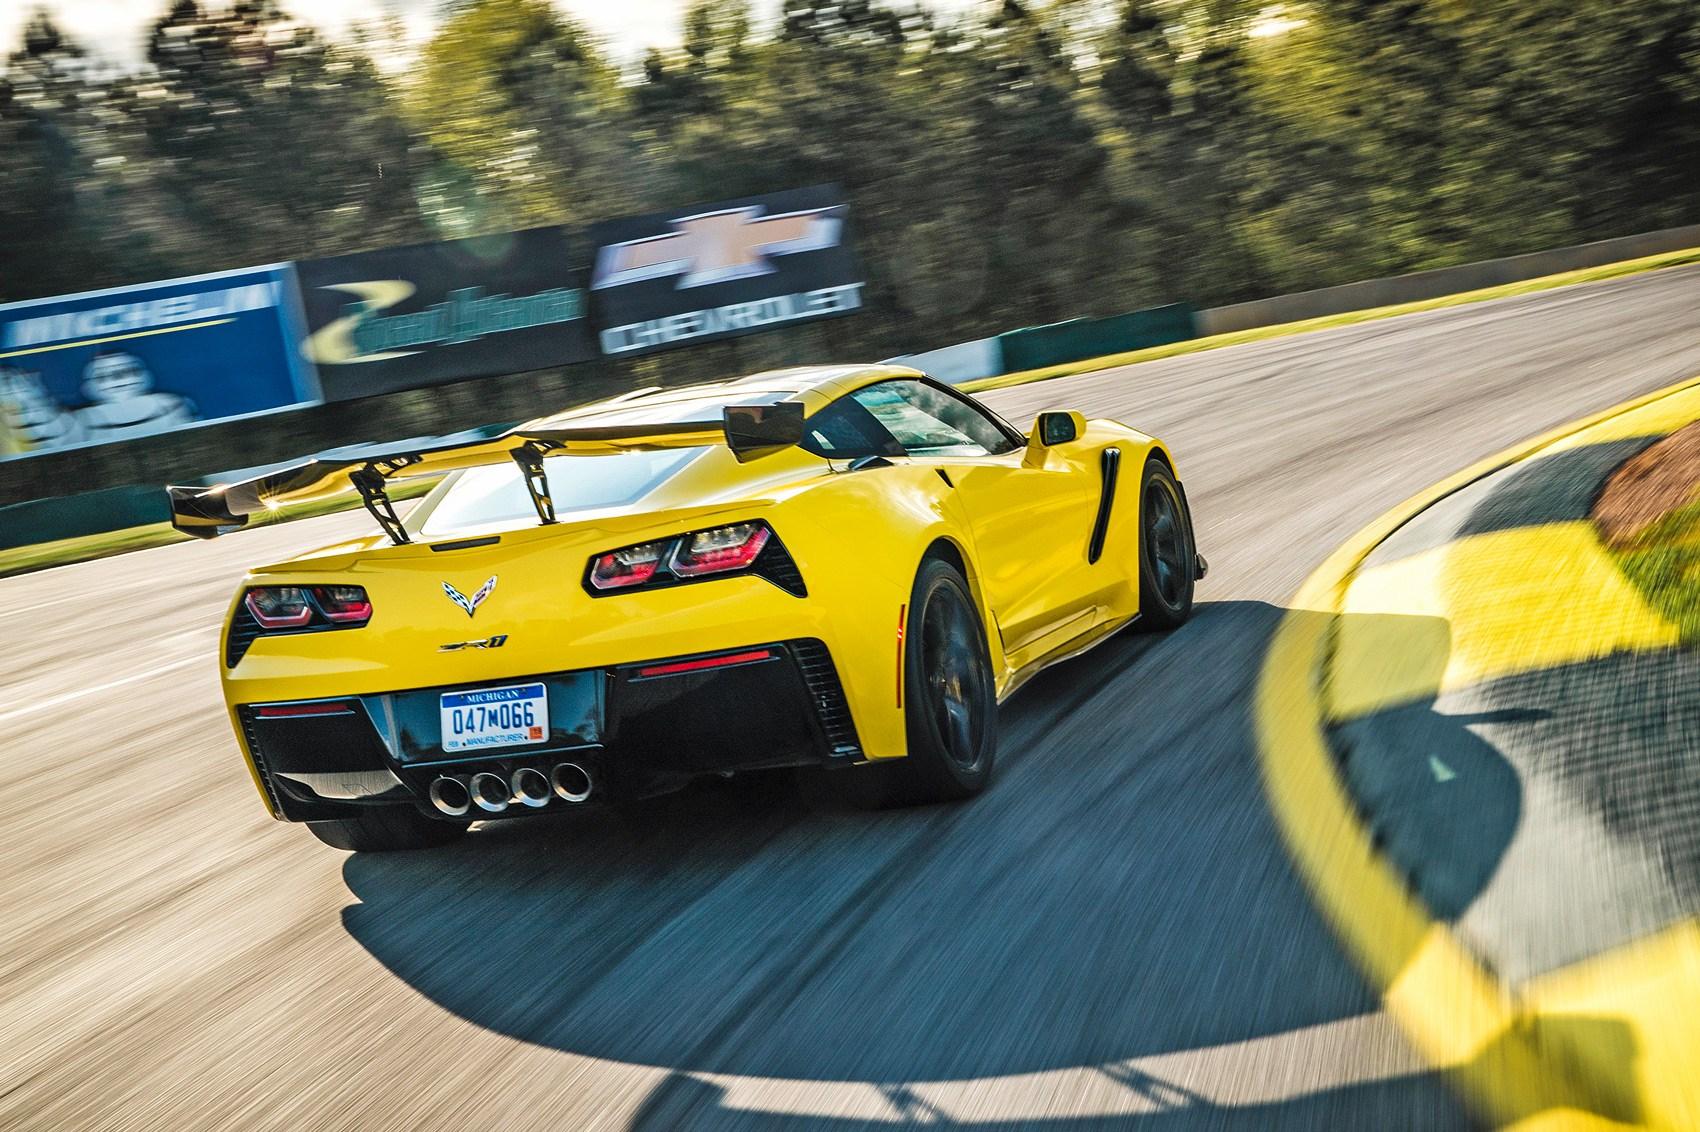 Kelebihan Kekurangan Chevrolet Corvette C7 Murah Berkualitas